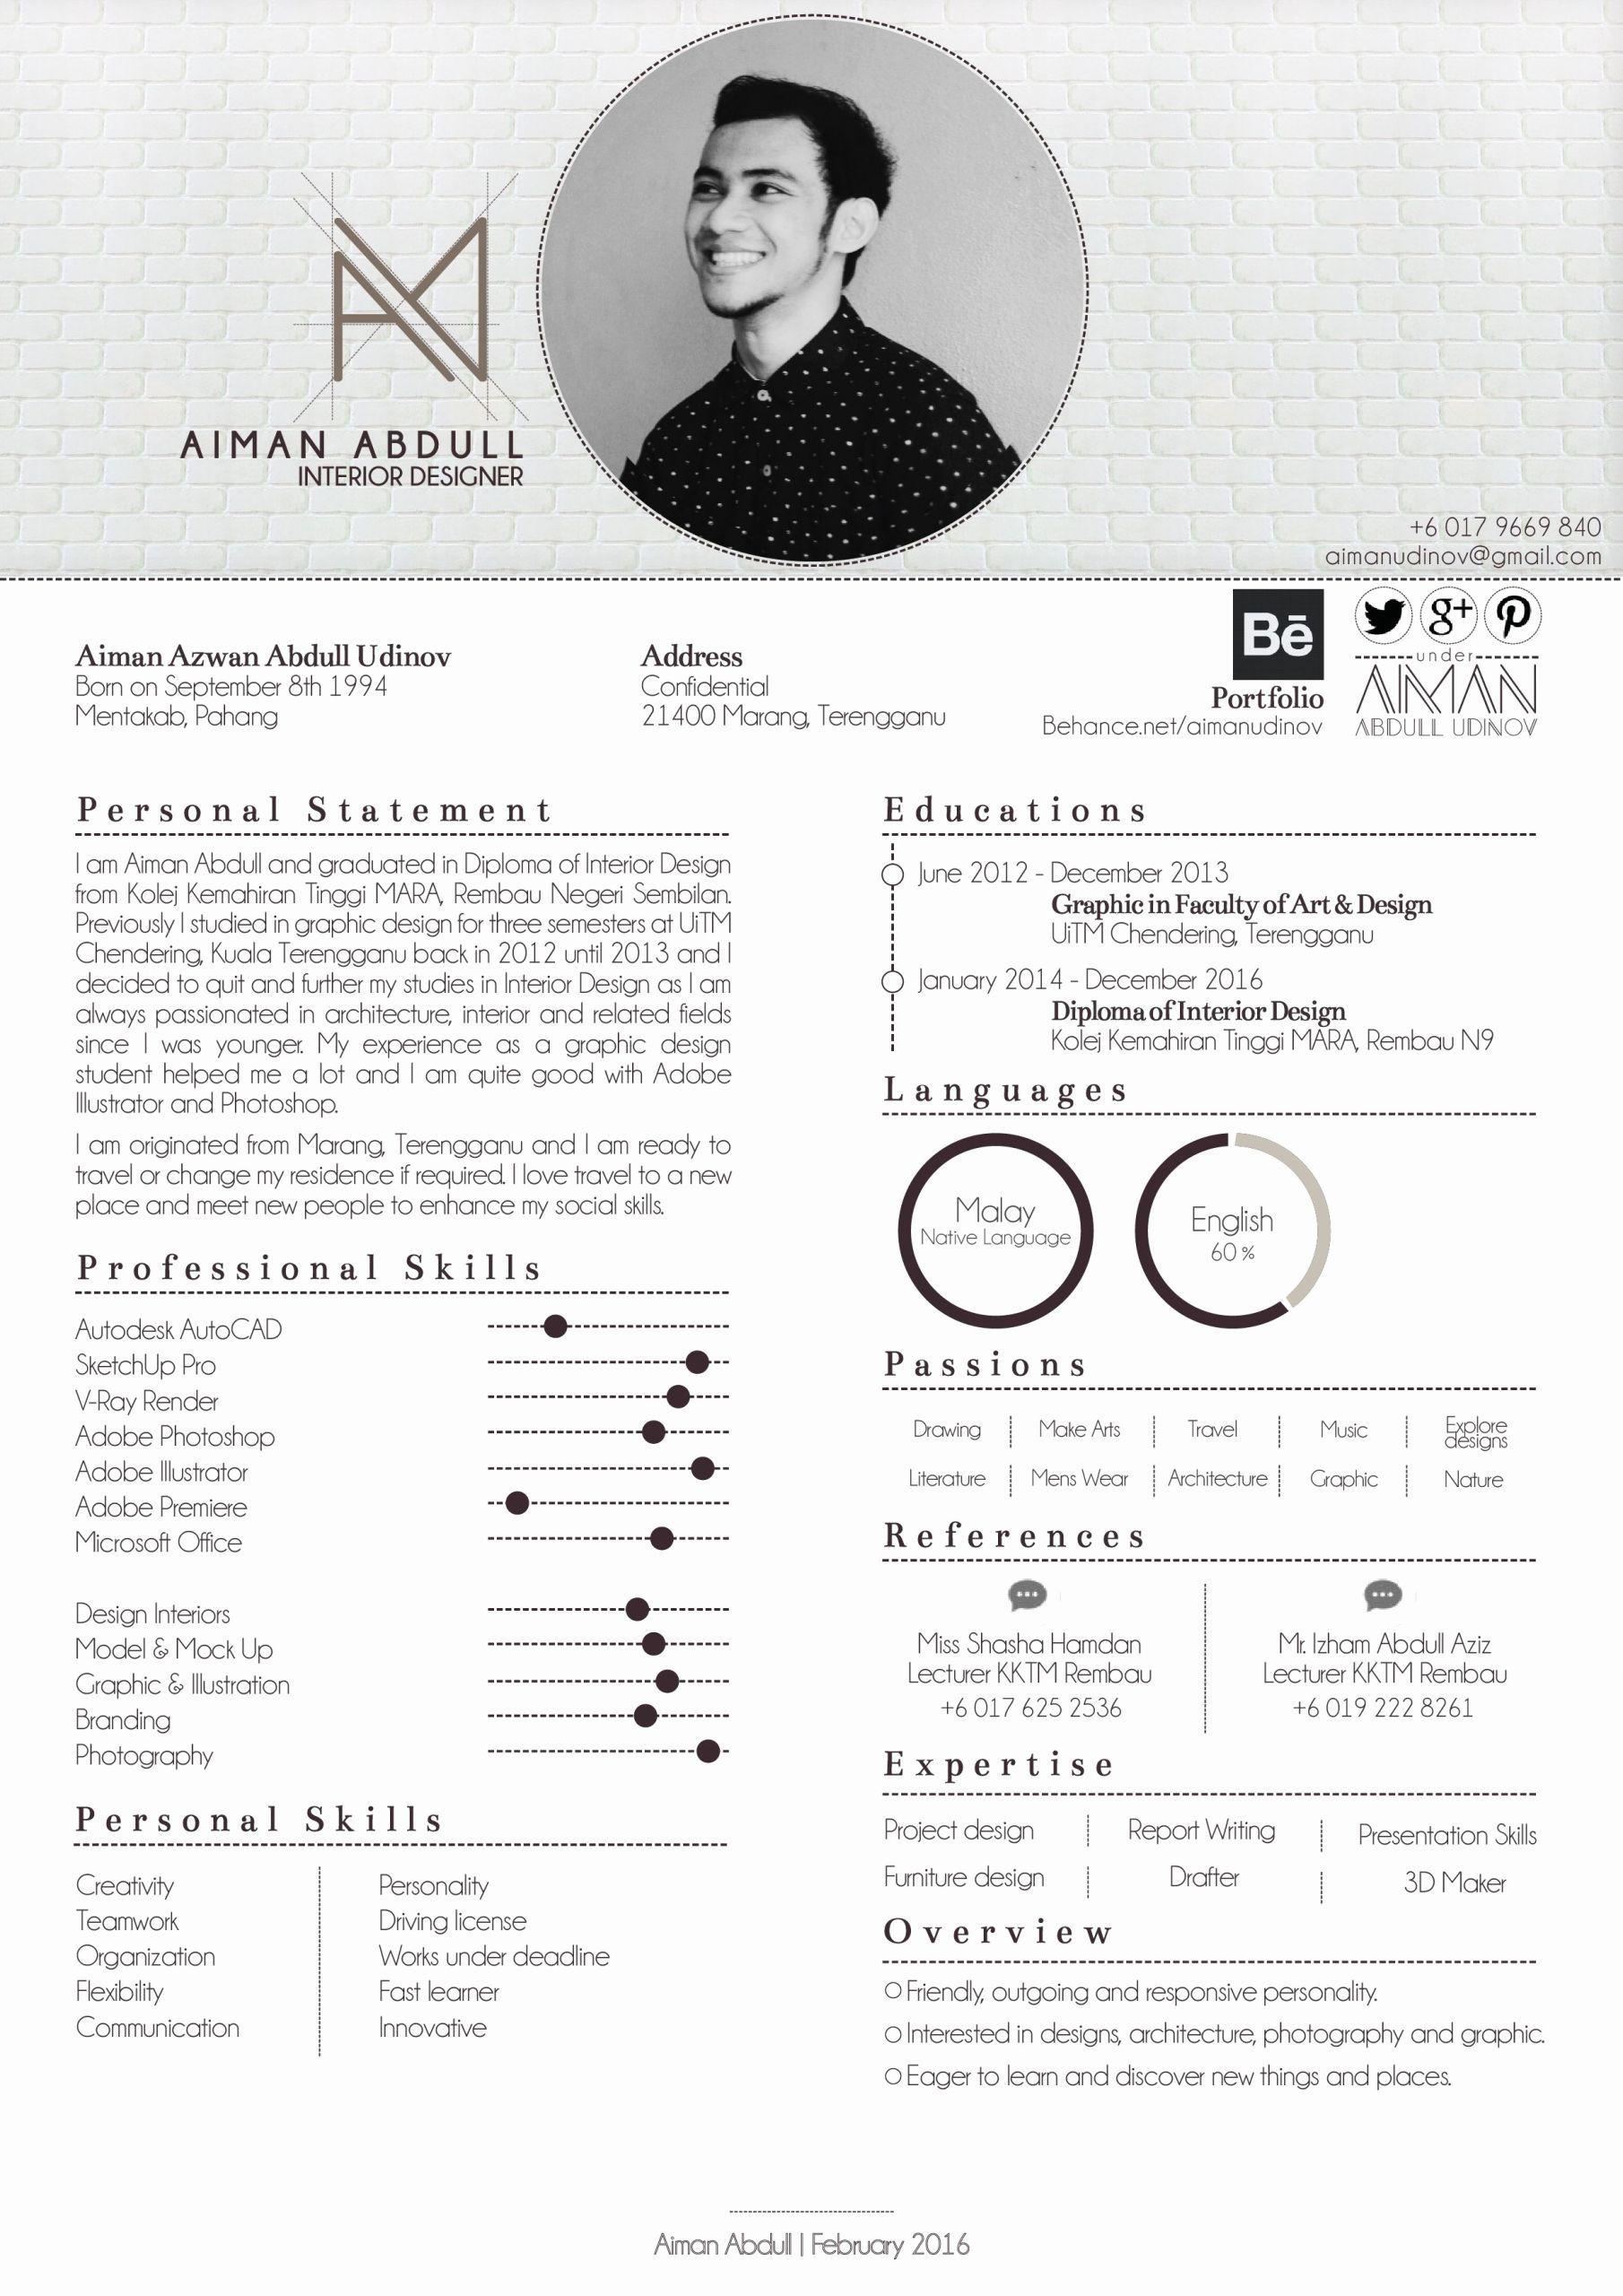 Interior Design Student Resume Beautiful Resume Of Aiman Abdull Resume Businesscard In 2020 Interior Design Resume Resume Design Creative Architecture Resume